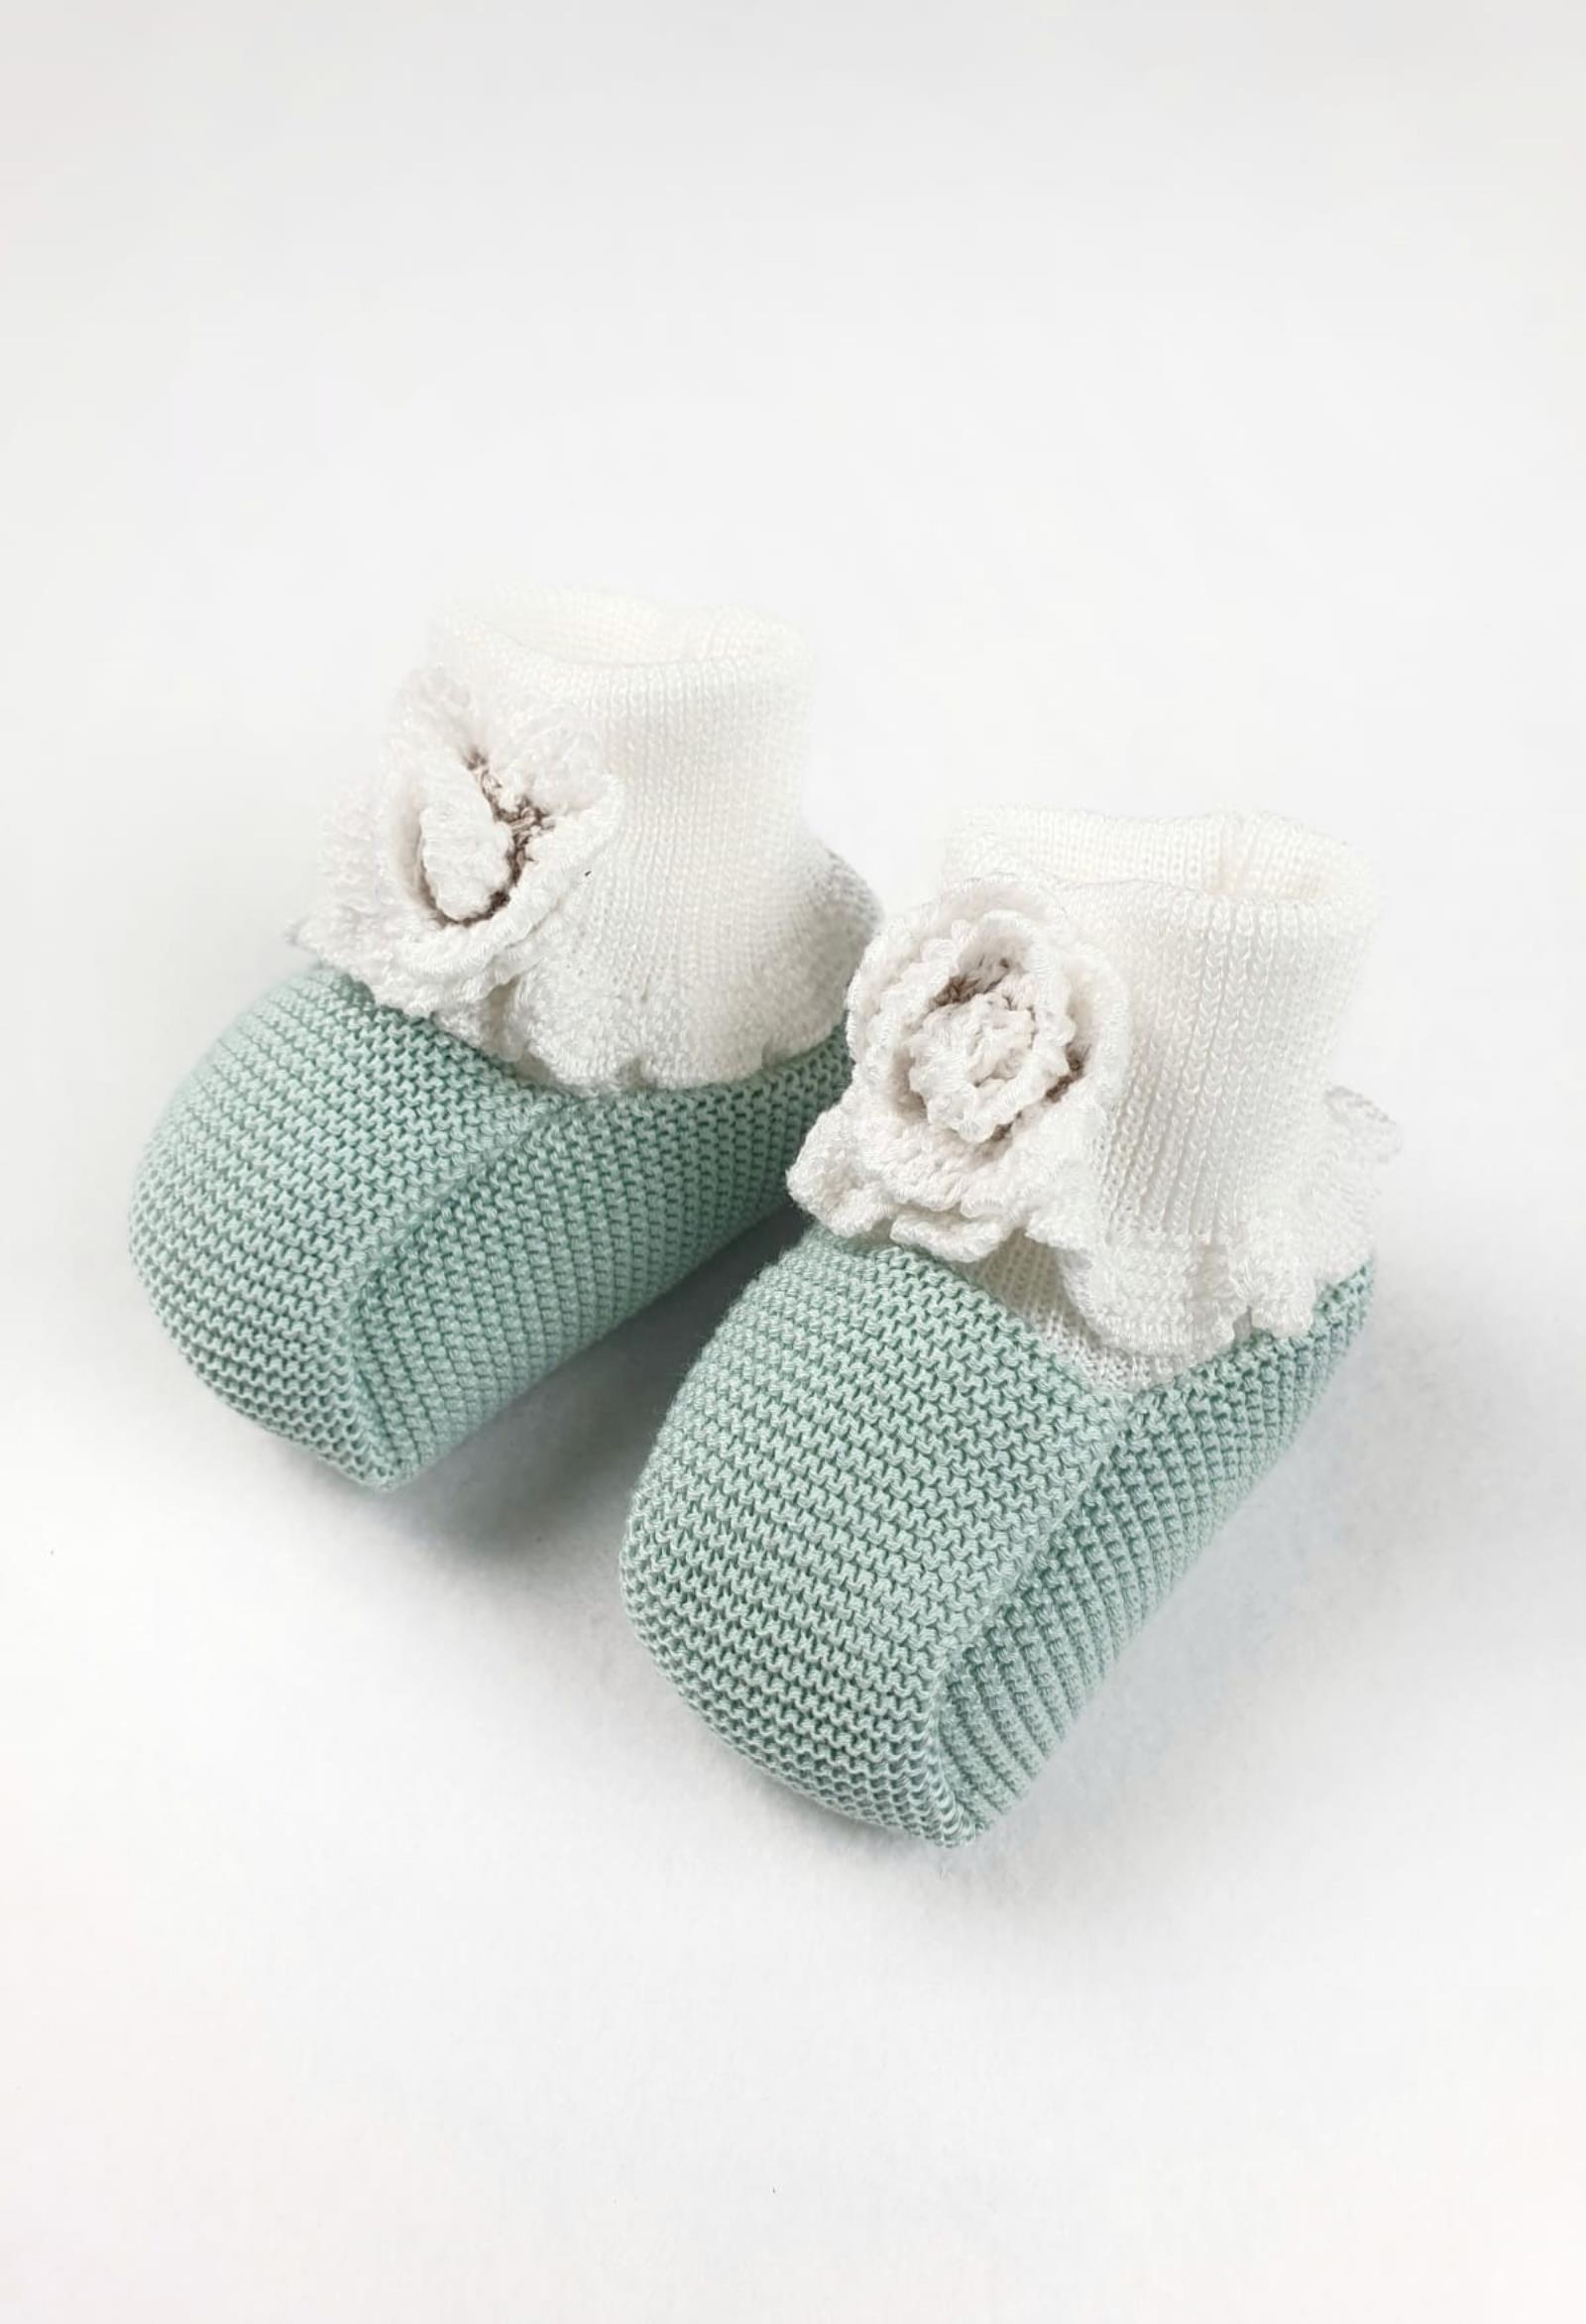 scarpe modello calzino verde salvia e bianche marlu | Scarpe | ES10SSALVIA